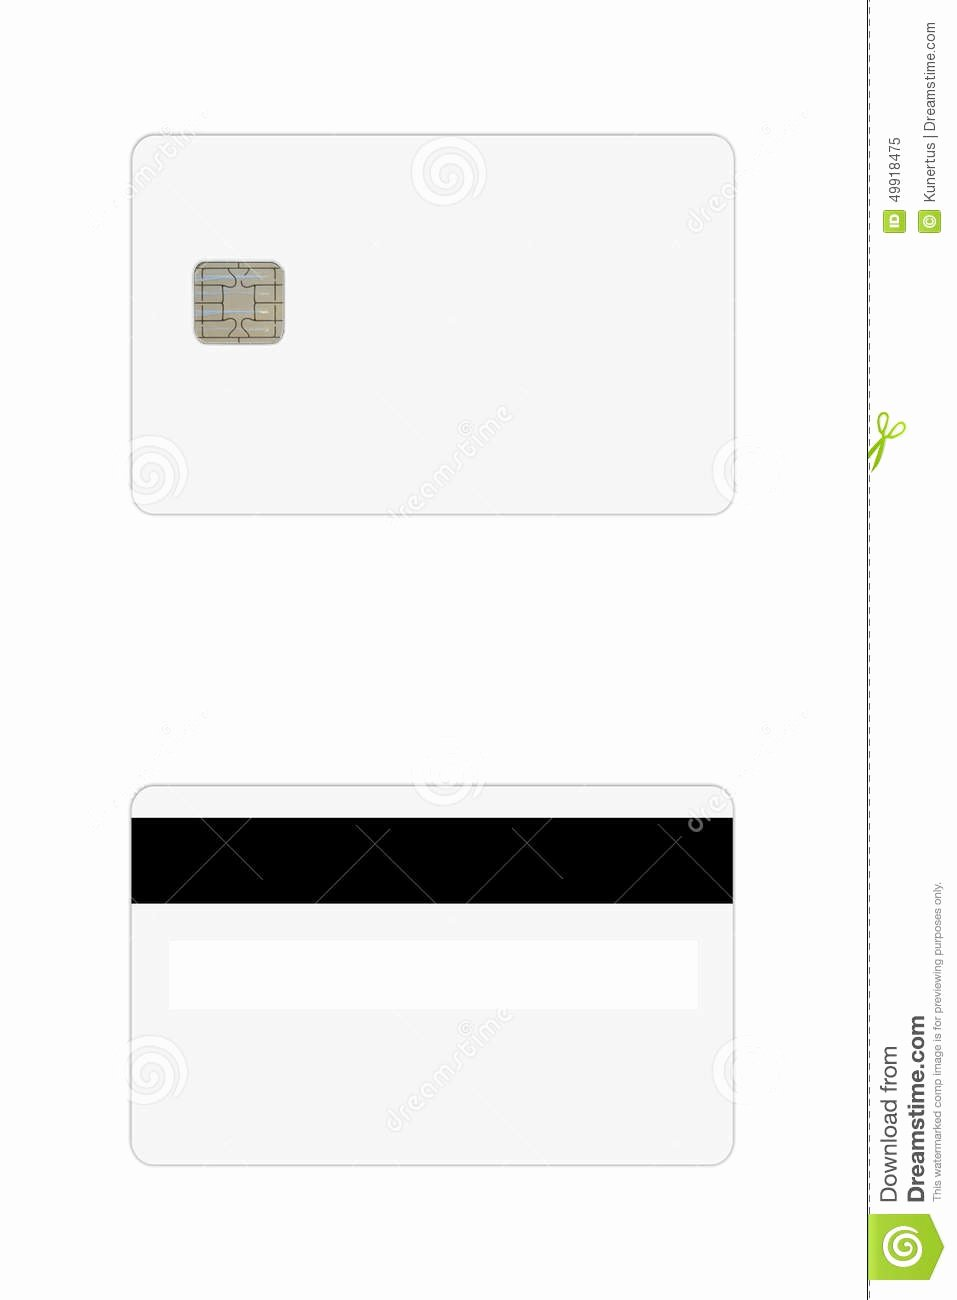 Blank Credit Card Template Inspirational Credit Debit Card Template Stock Image